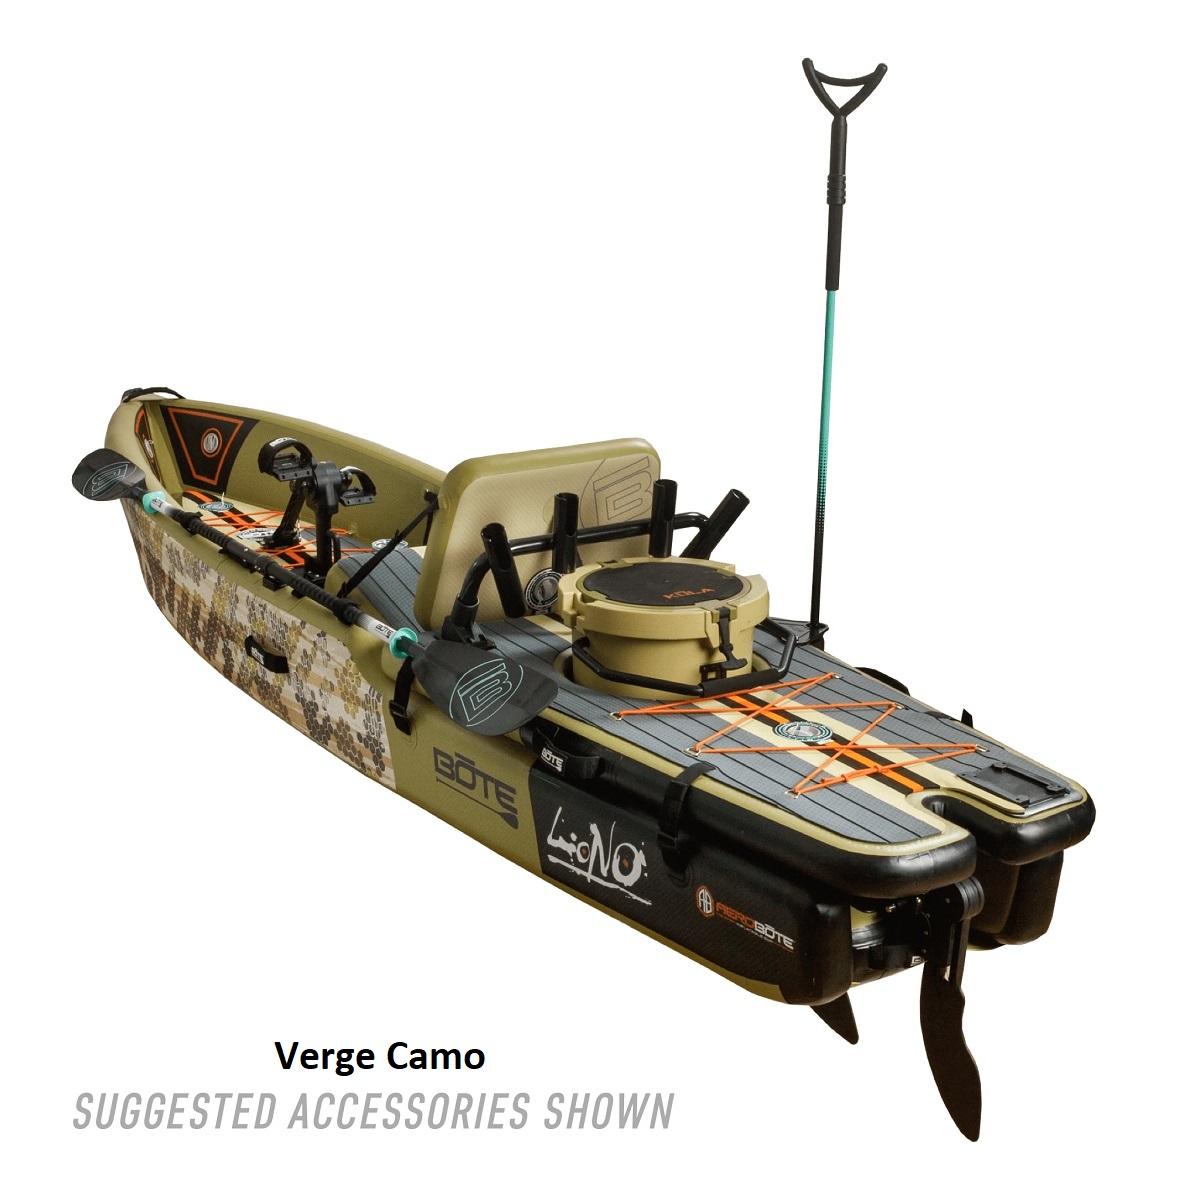 BOTE Lono Inflatable Kayak - Verge Camo 2